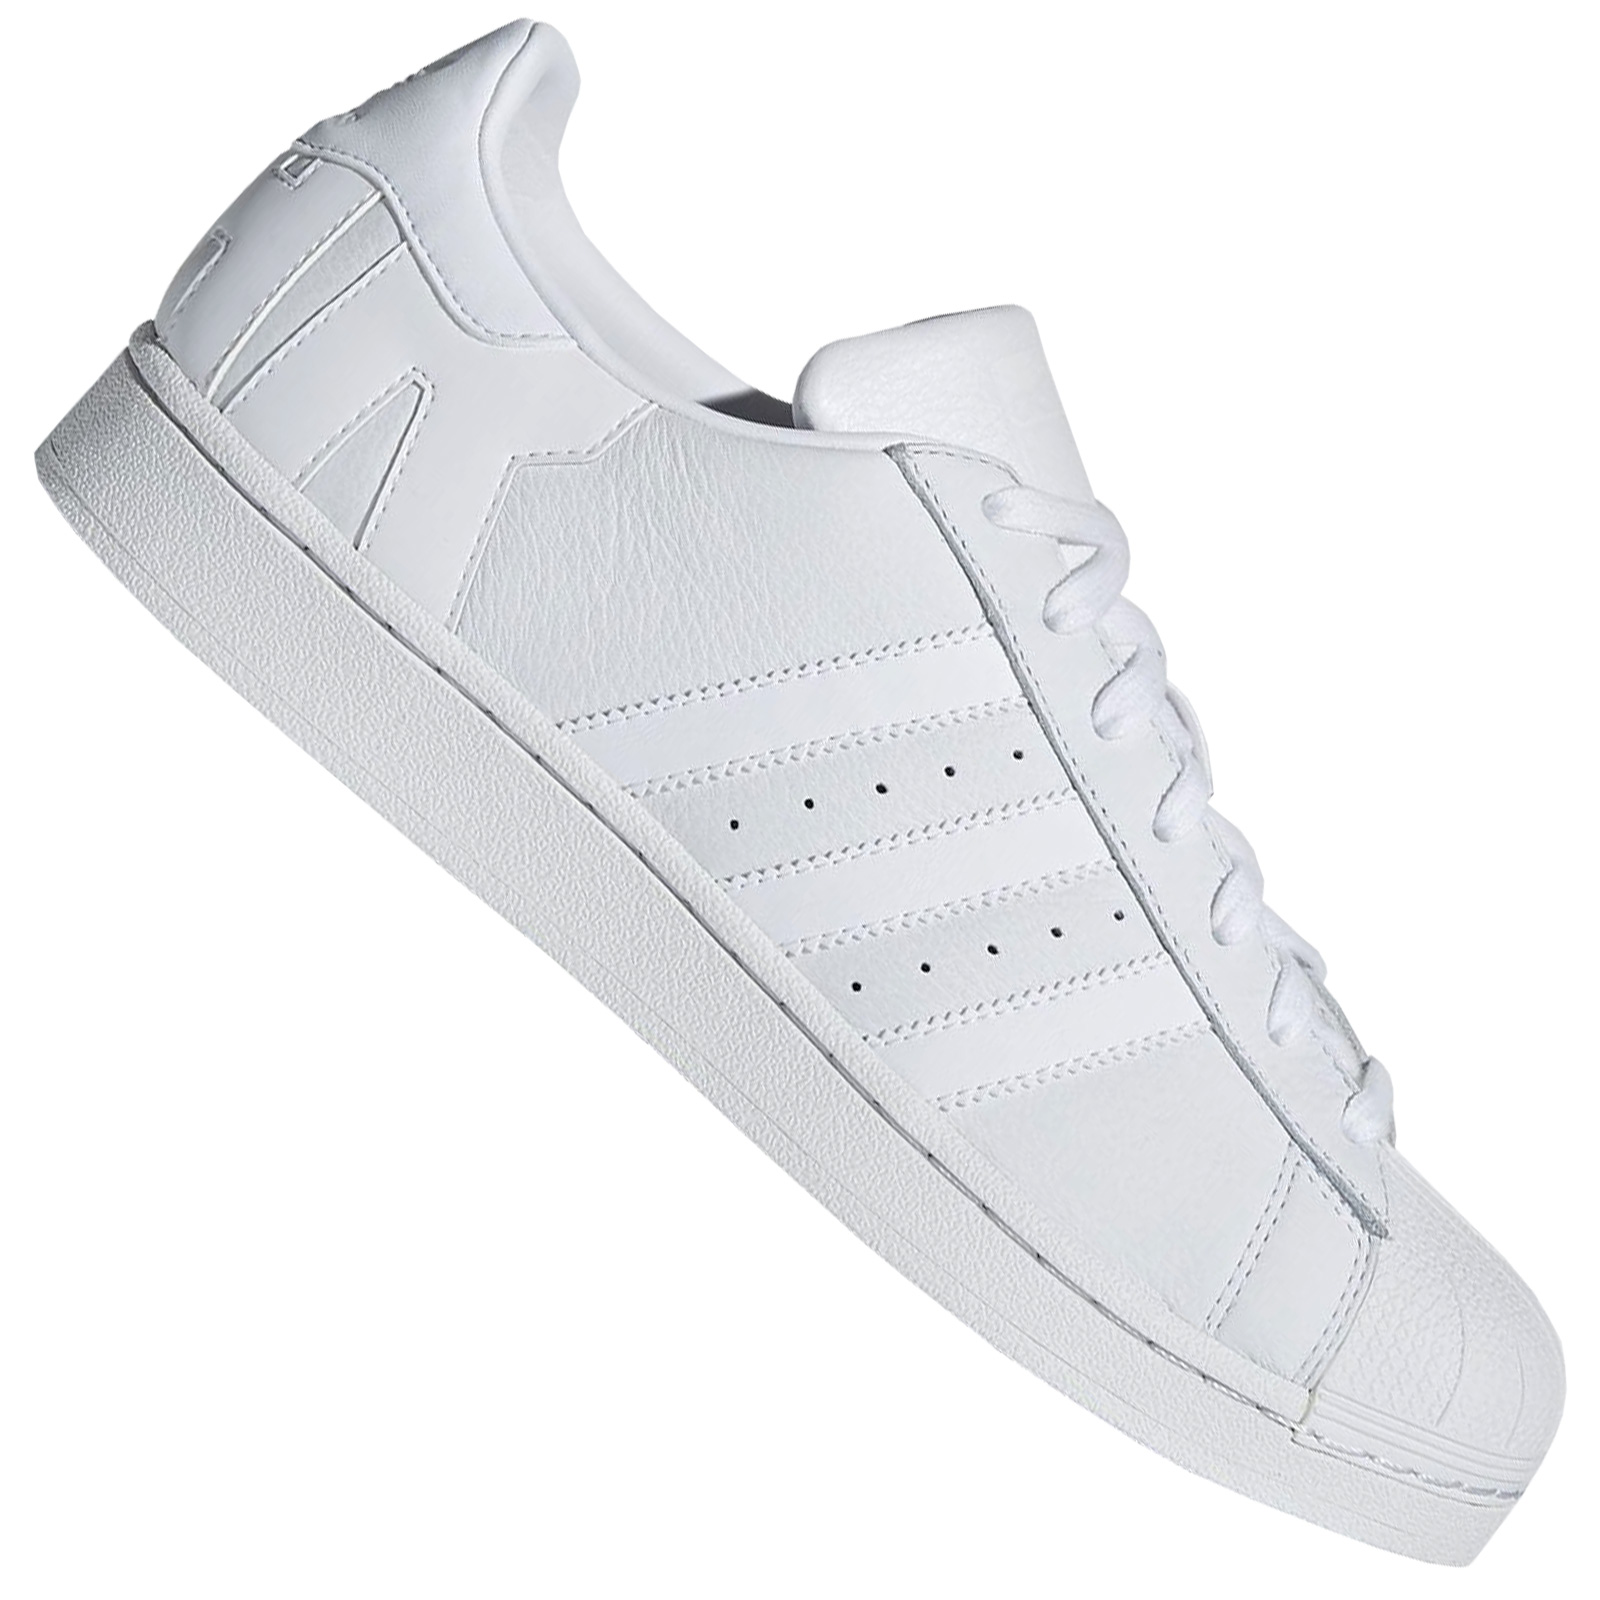 Details about Adidas Originals Superstar Women's Sneaker Trainers Super & Star Logo White